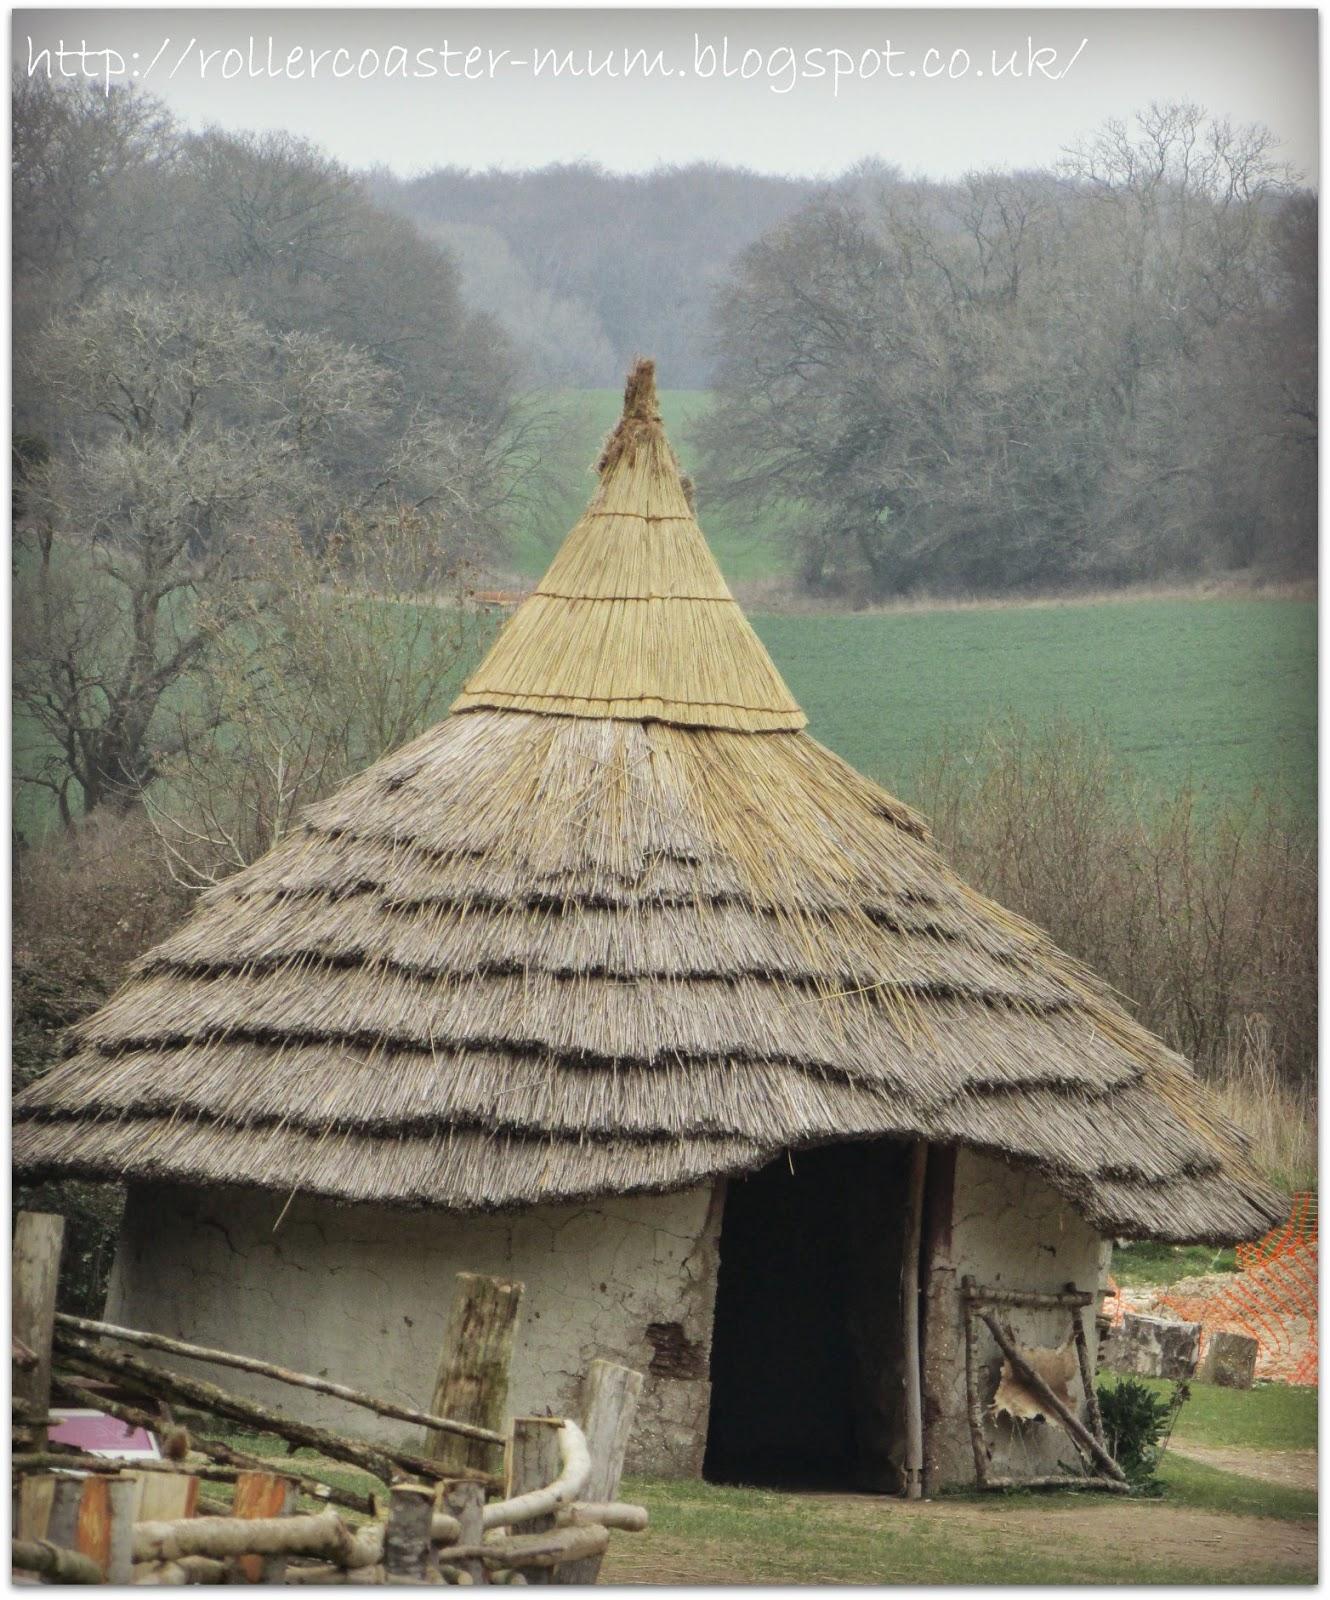 Celtic roundhouse dwelling - Butser Ancient Farm